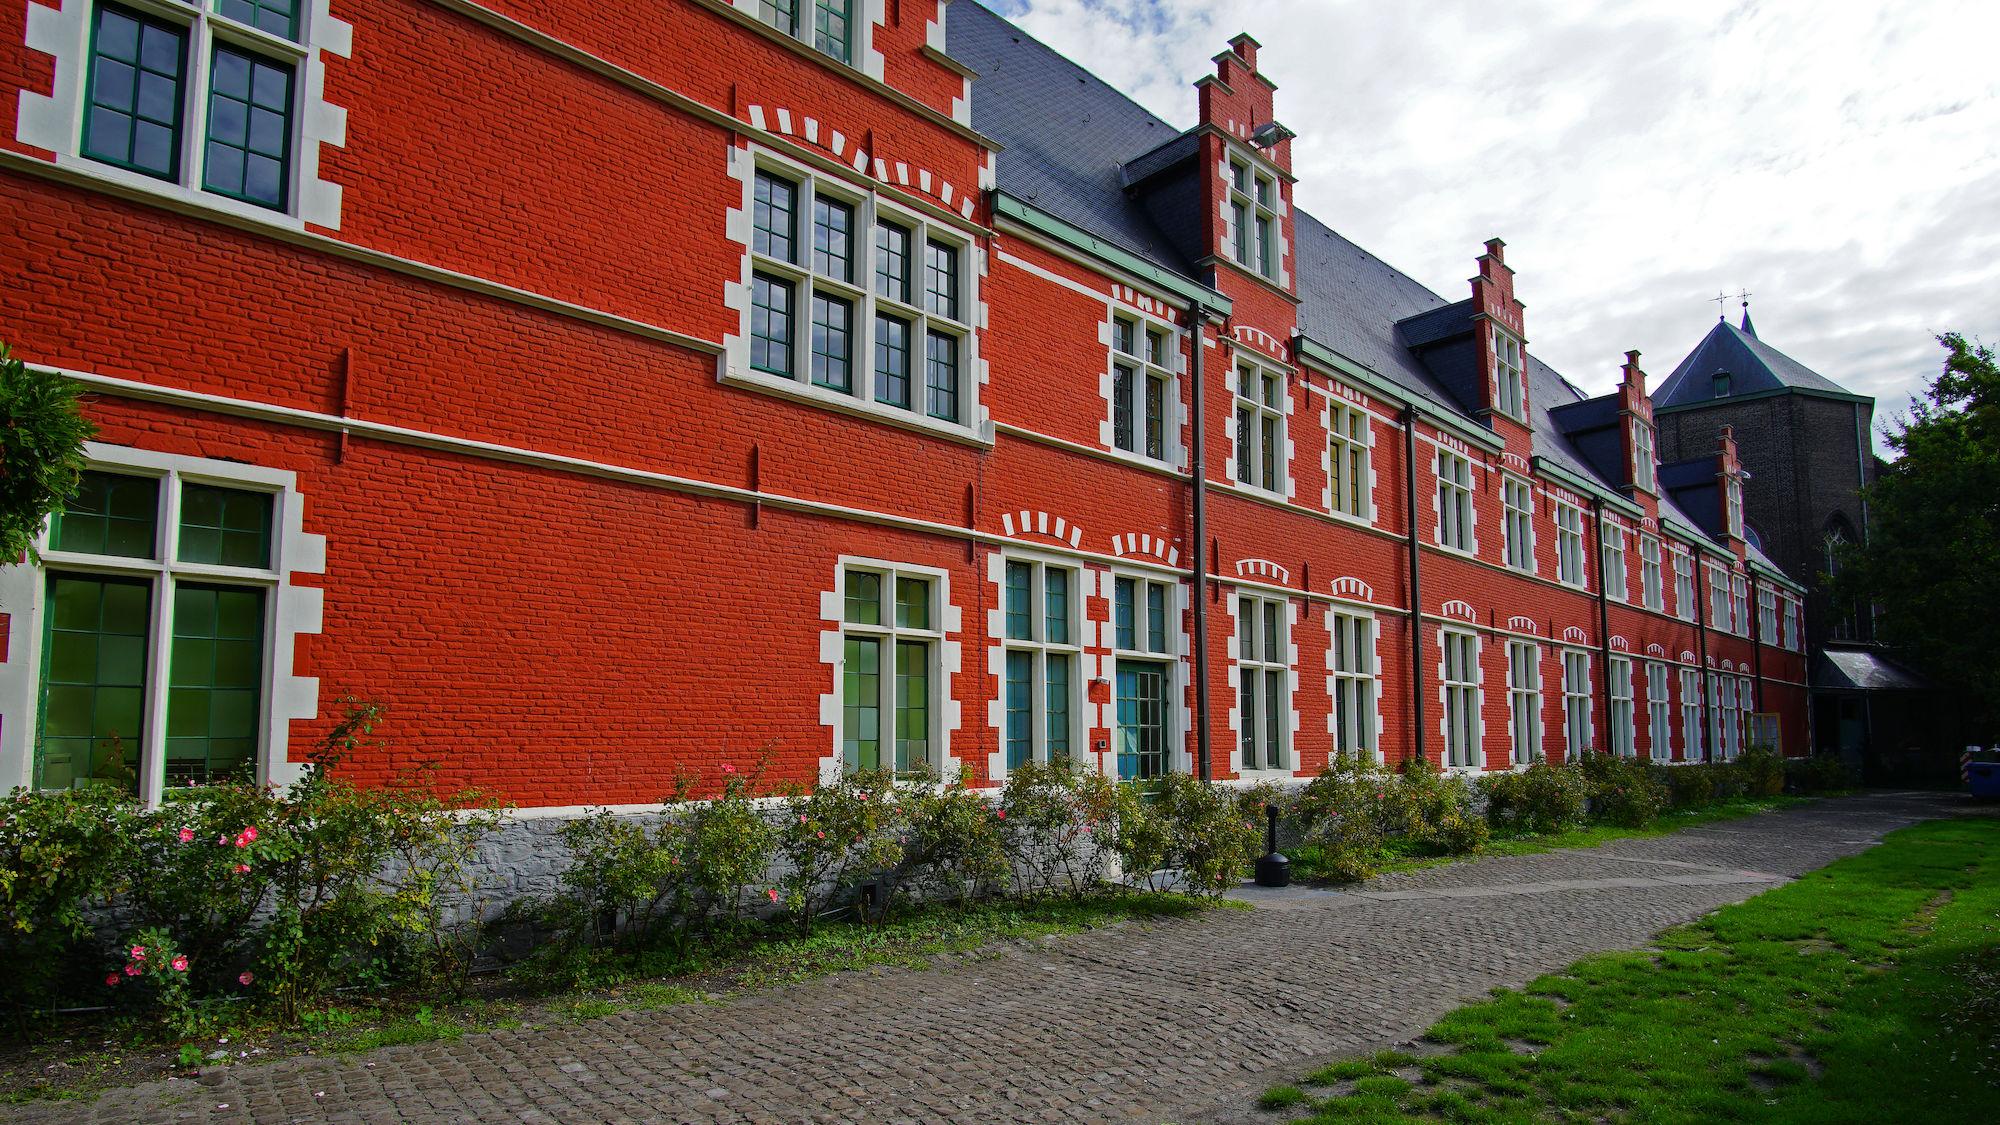 KU Leuven, Faculteit architectuur, campus Sint-Lucas